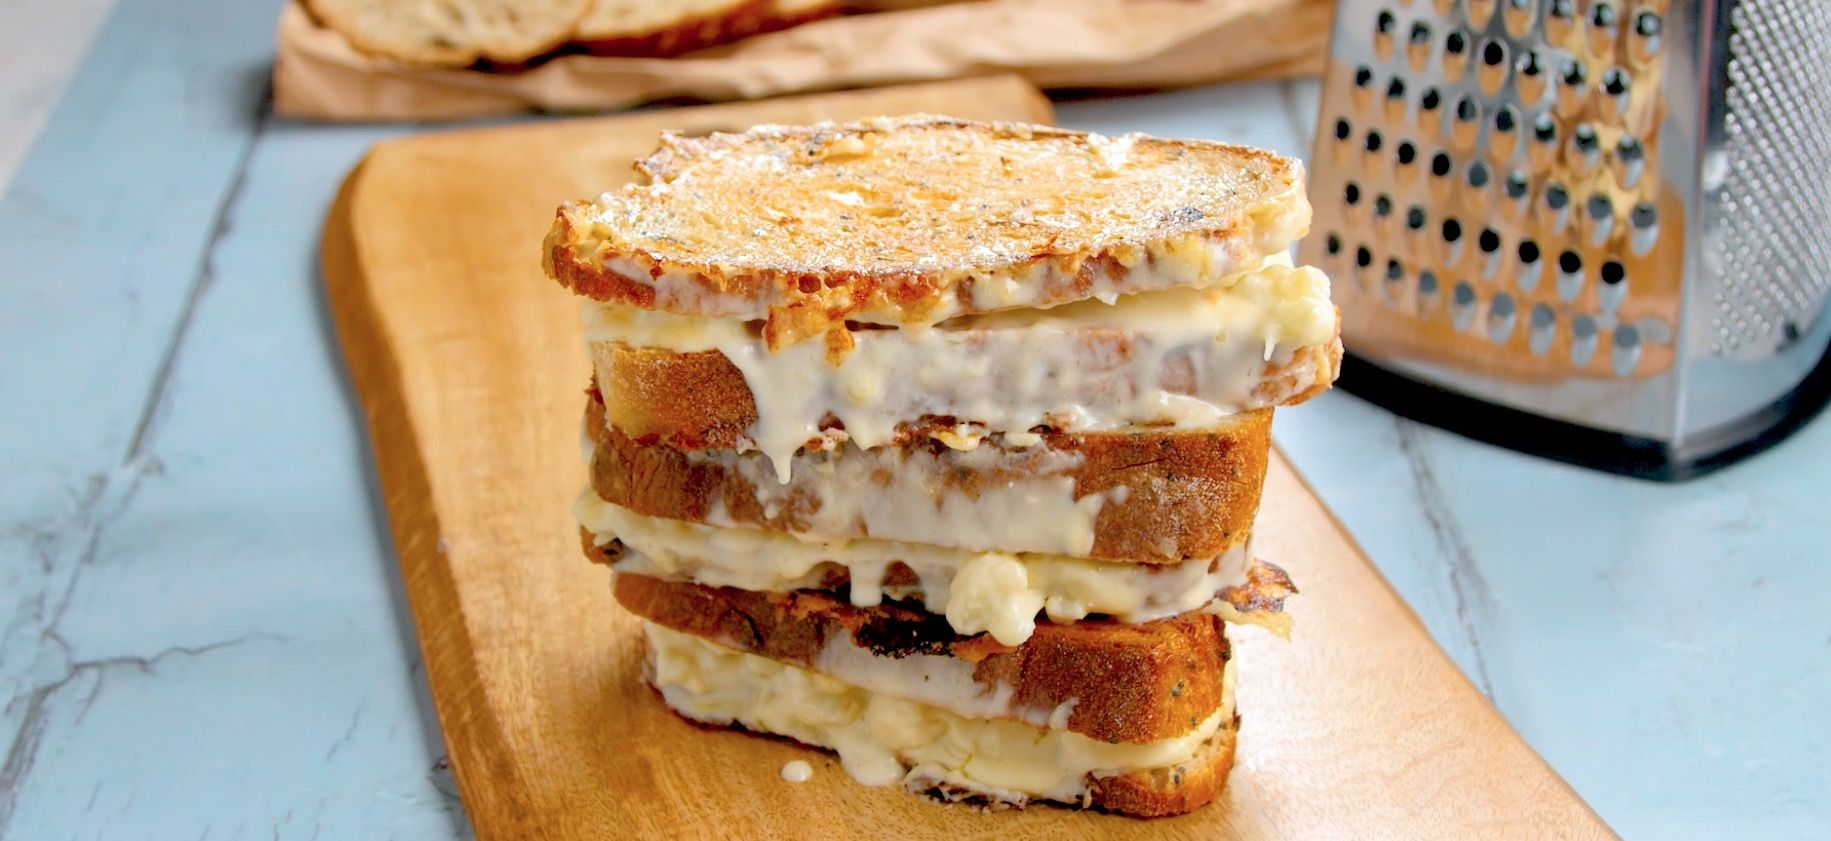 Cauliflower Cheese Toastie